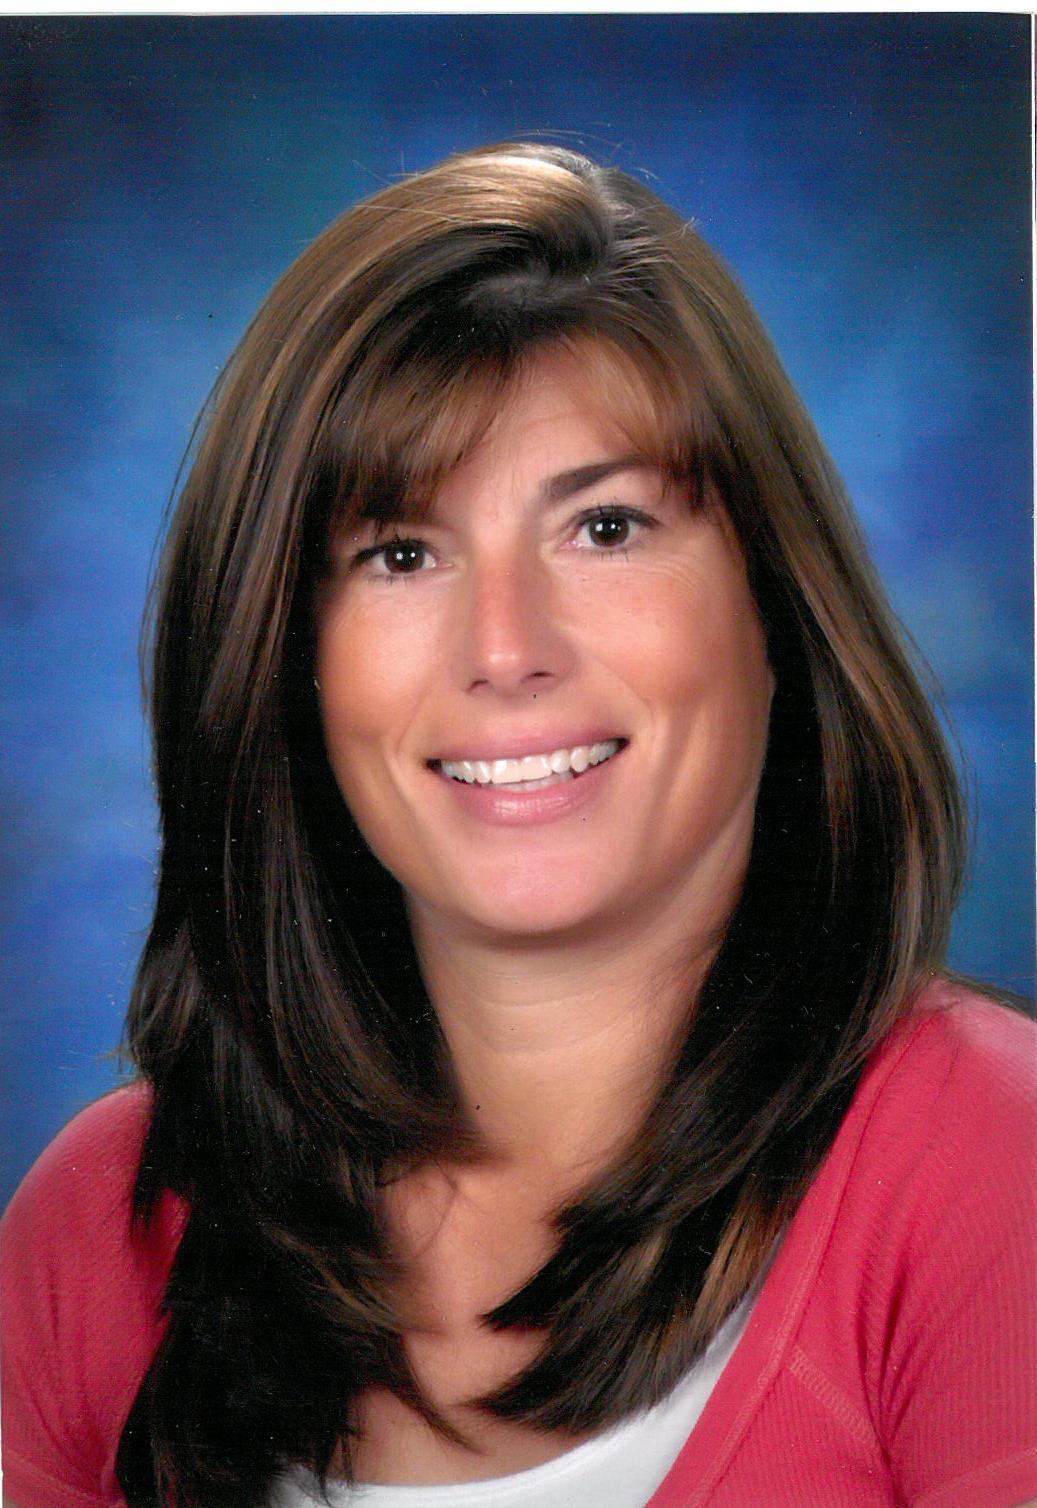 Heather Miller  Co-Director of Program   hitchcockschool@hitchcockpresby.org